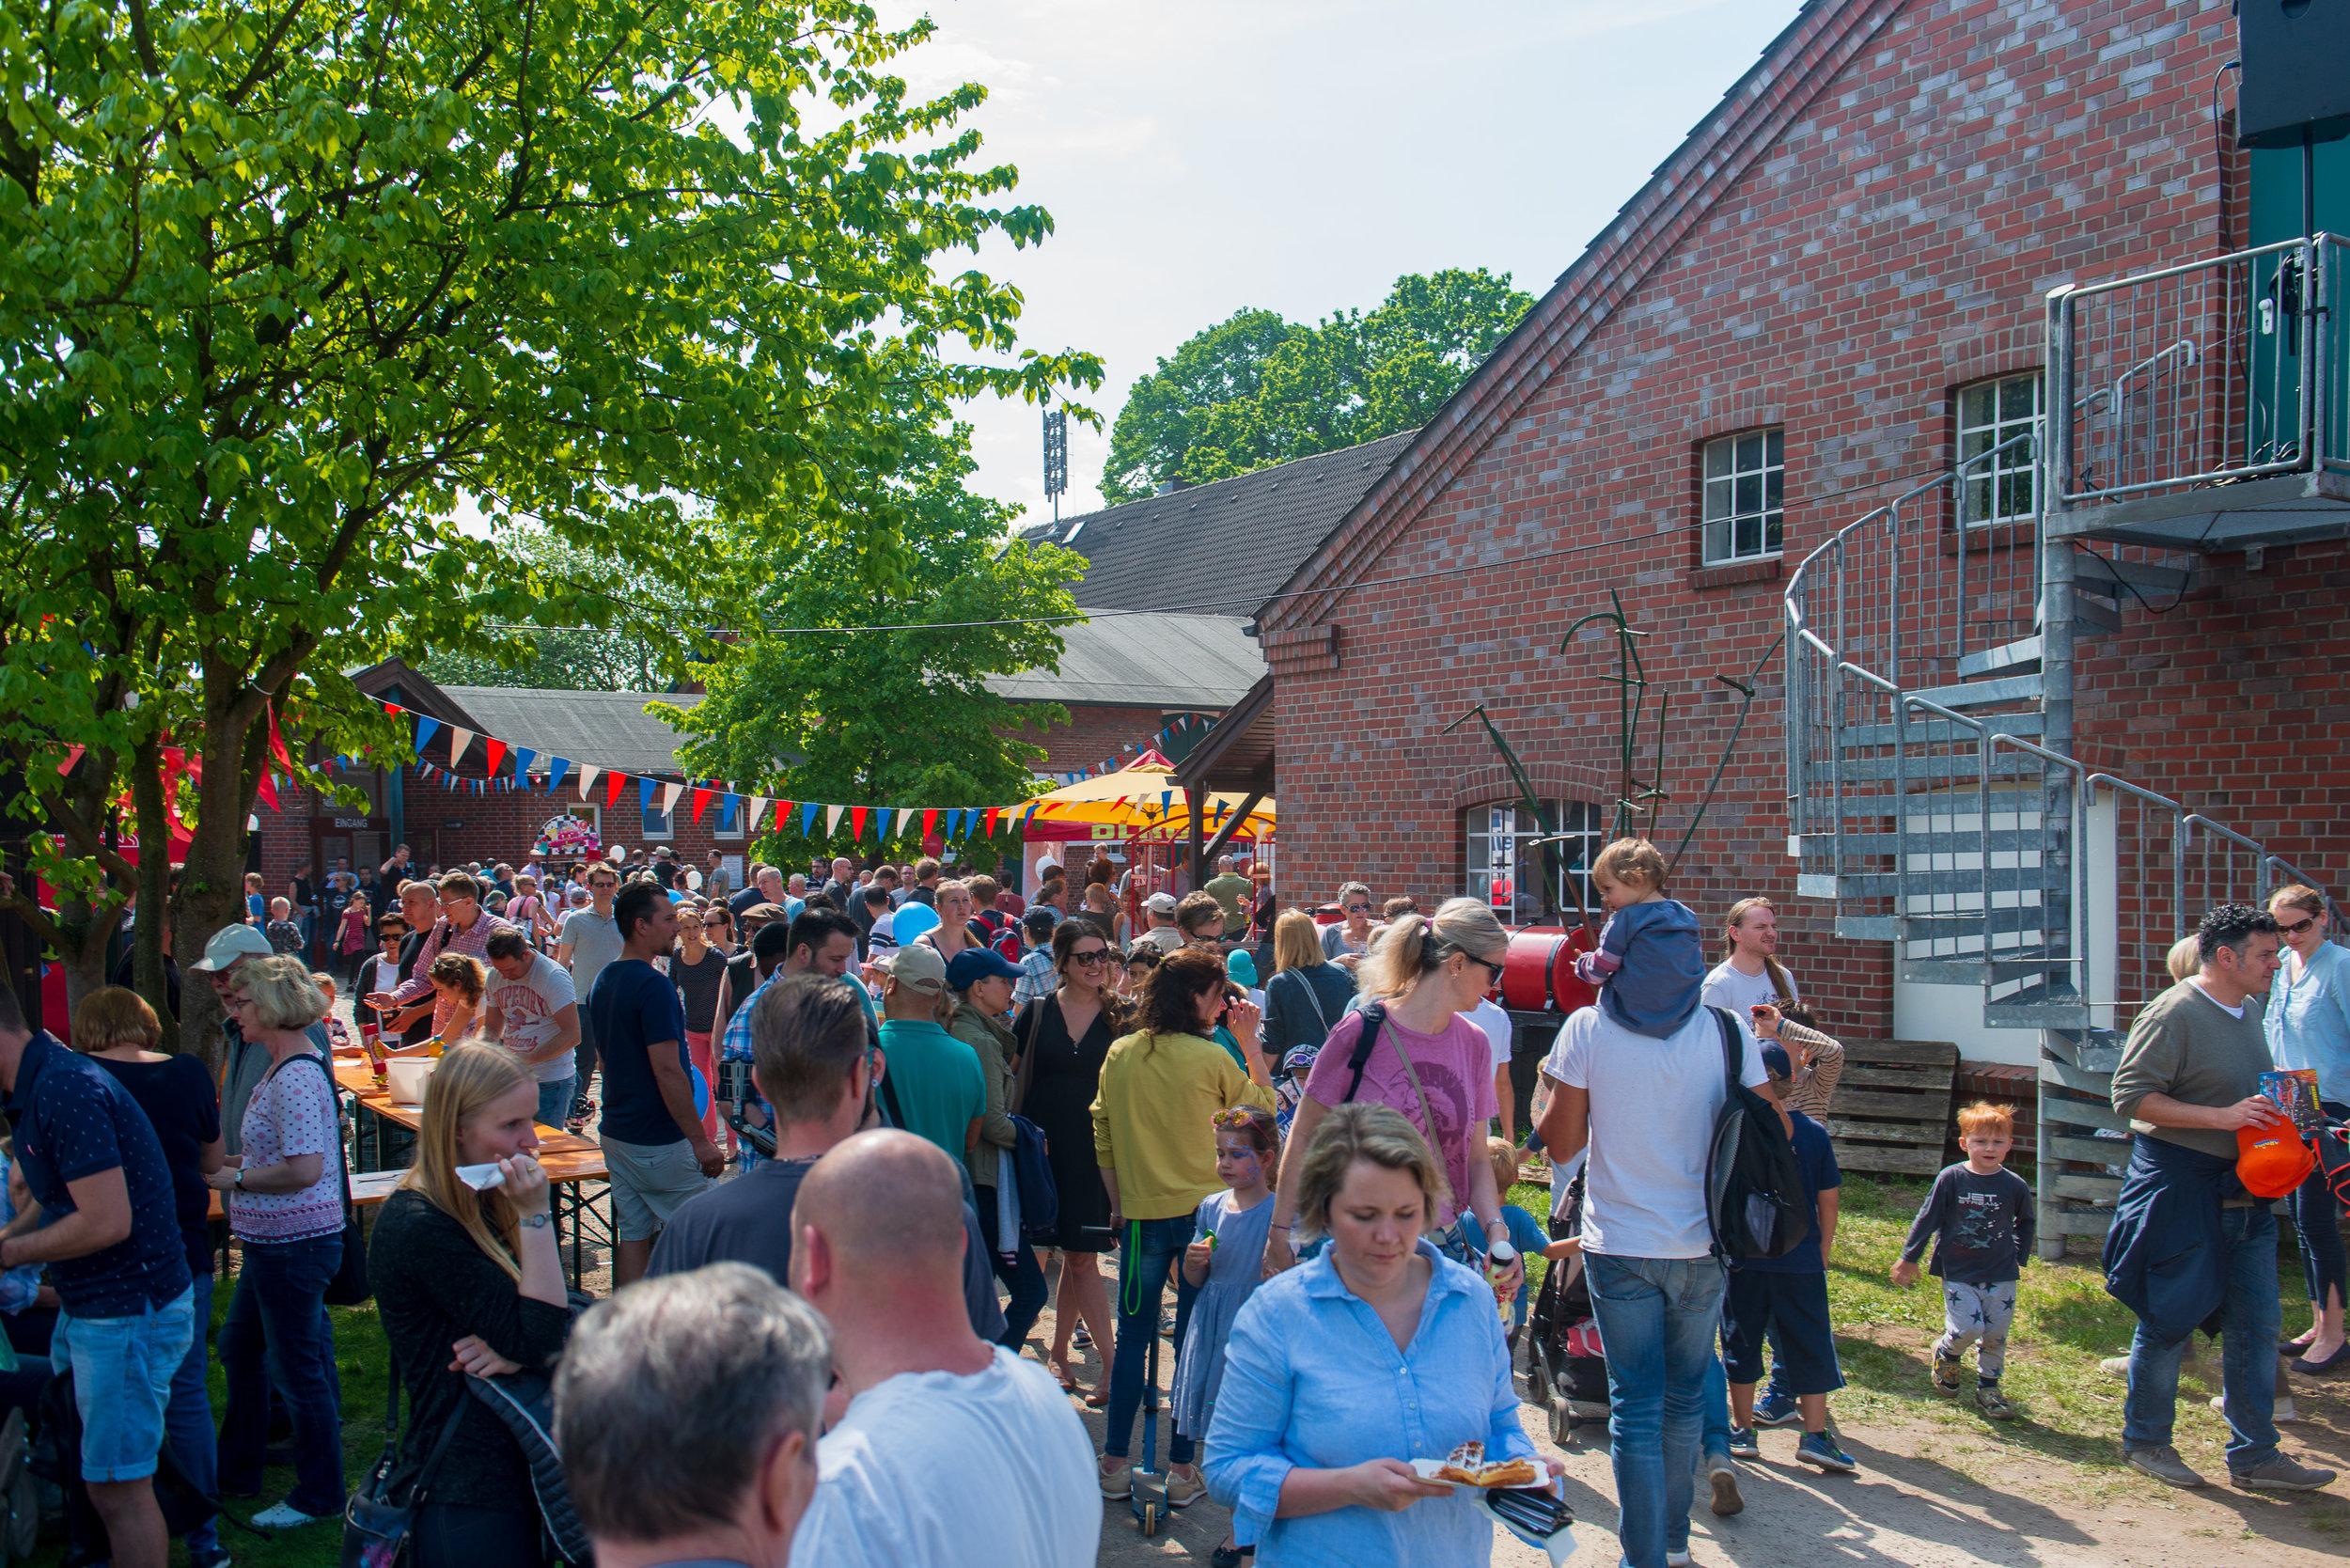 13-Norderstedter-Museumsfest-2019-FWM--XO-Dennys-Mamero-WEB-53.jpg